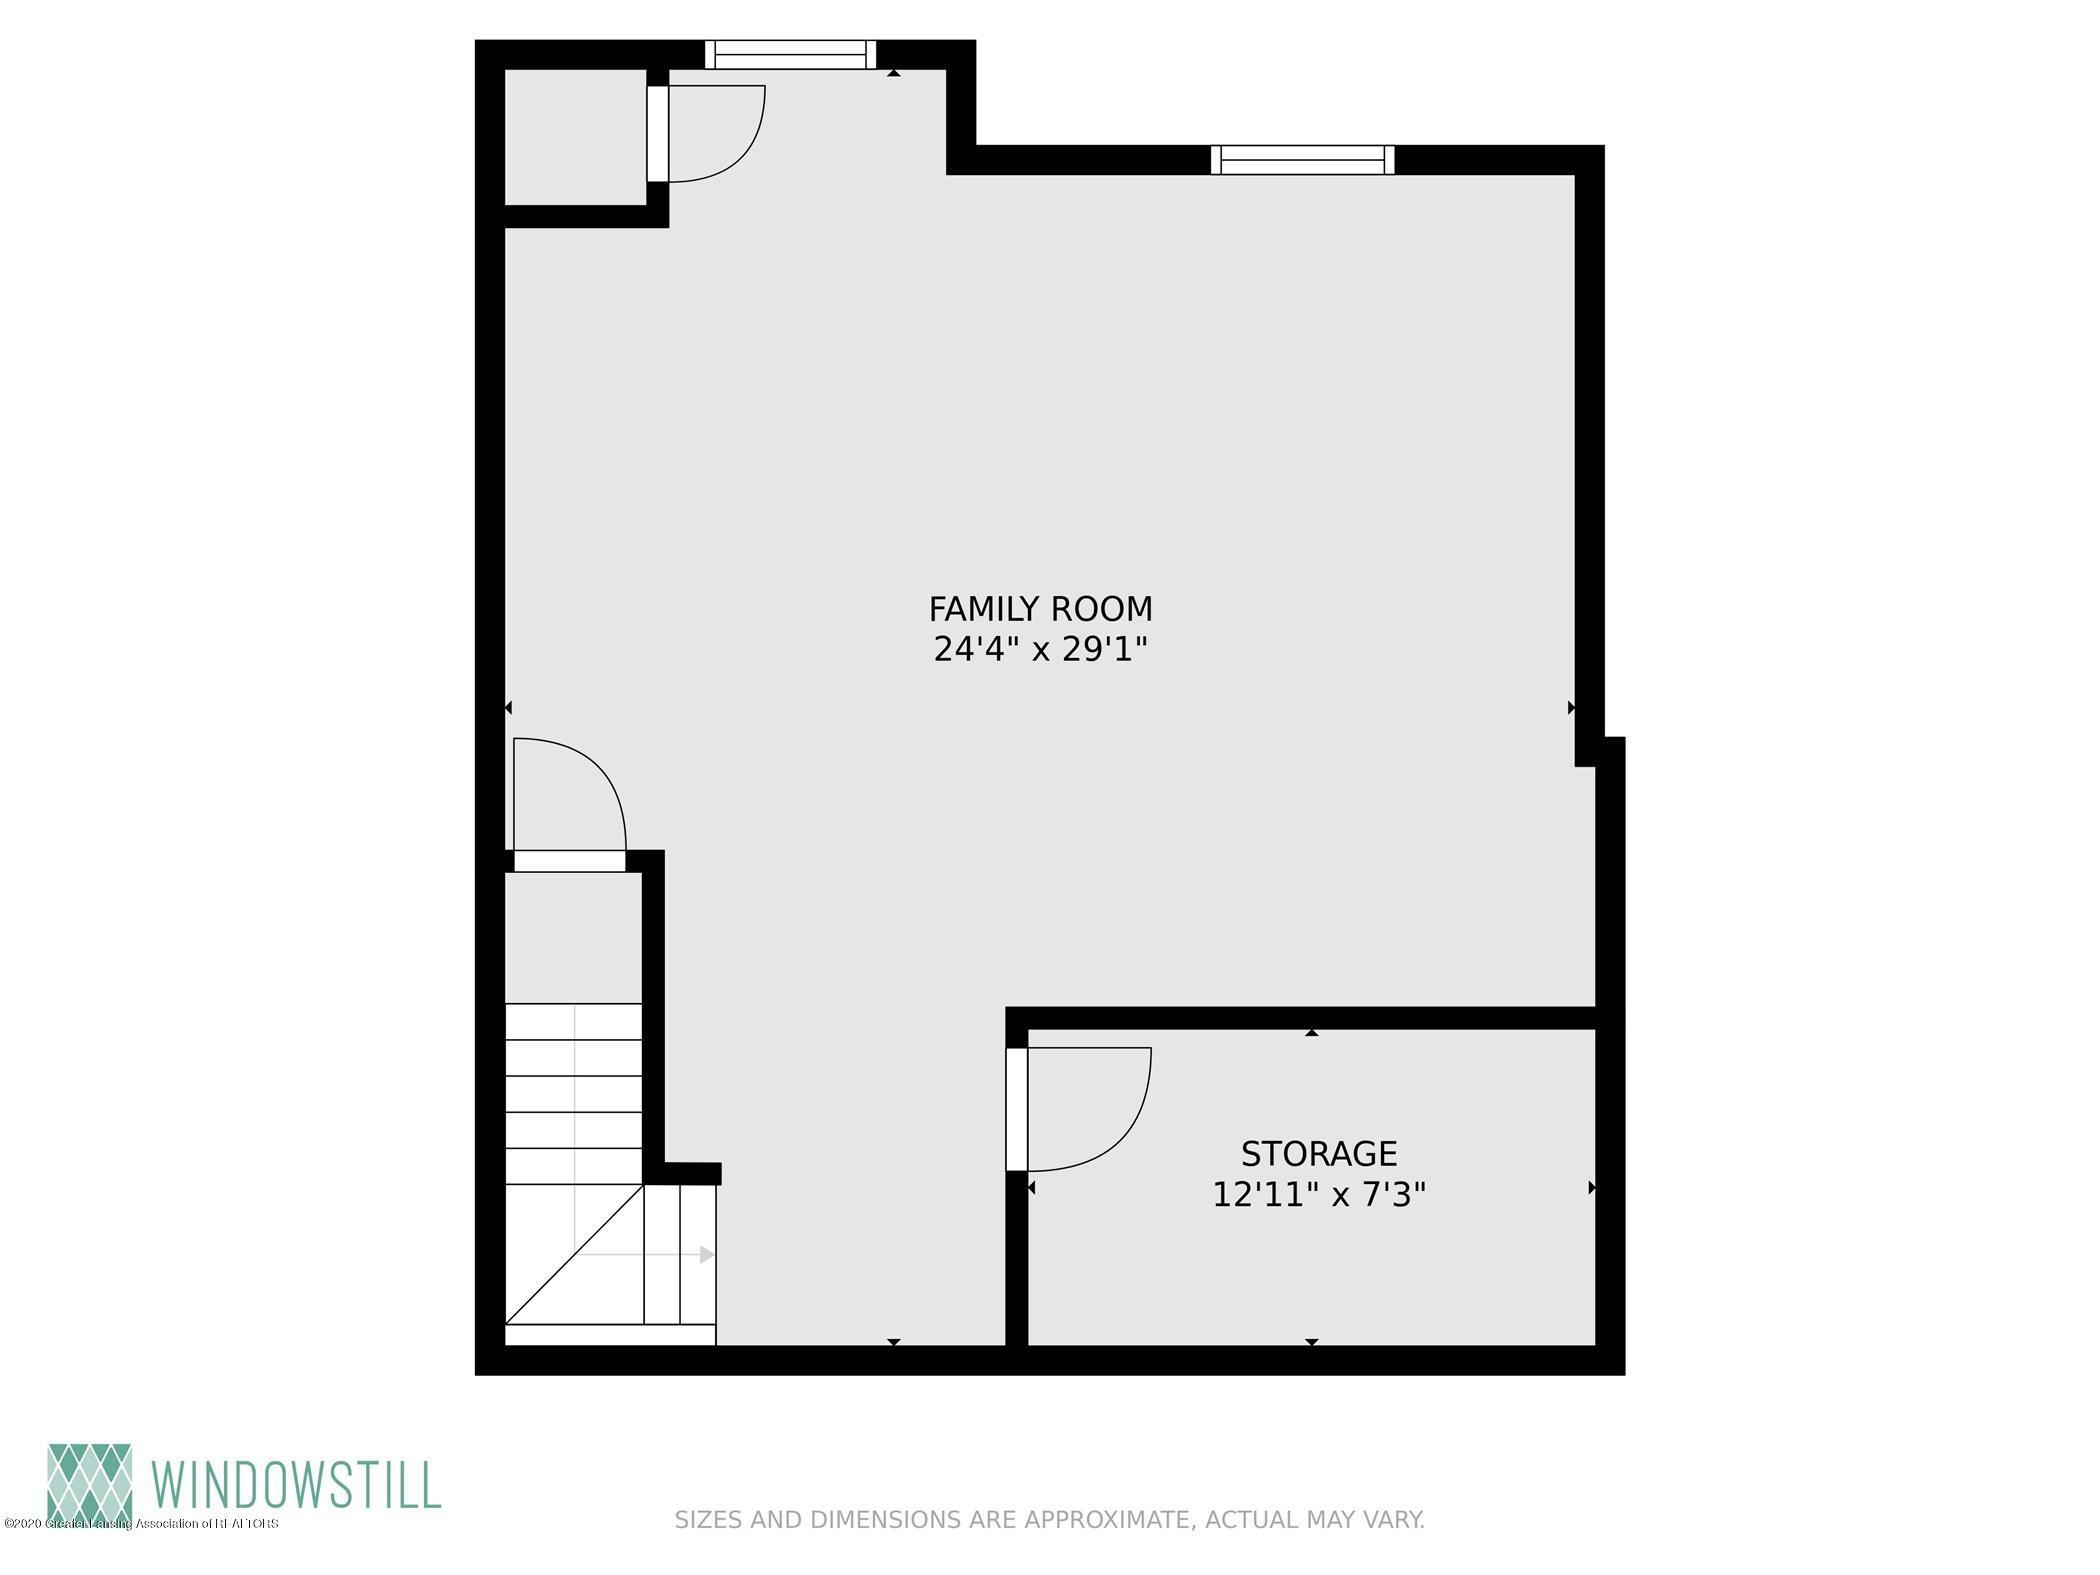 532 Anhinga Dr - 03-single-floor-dim_0 - 39